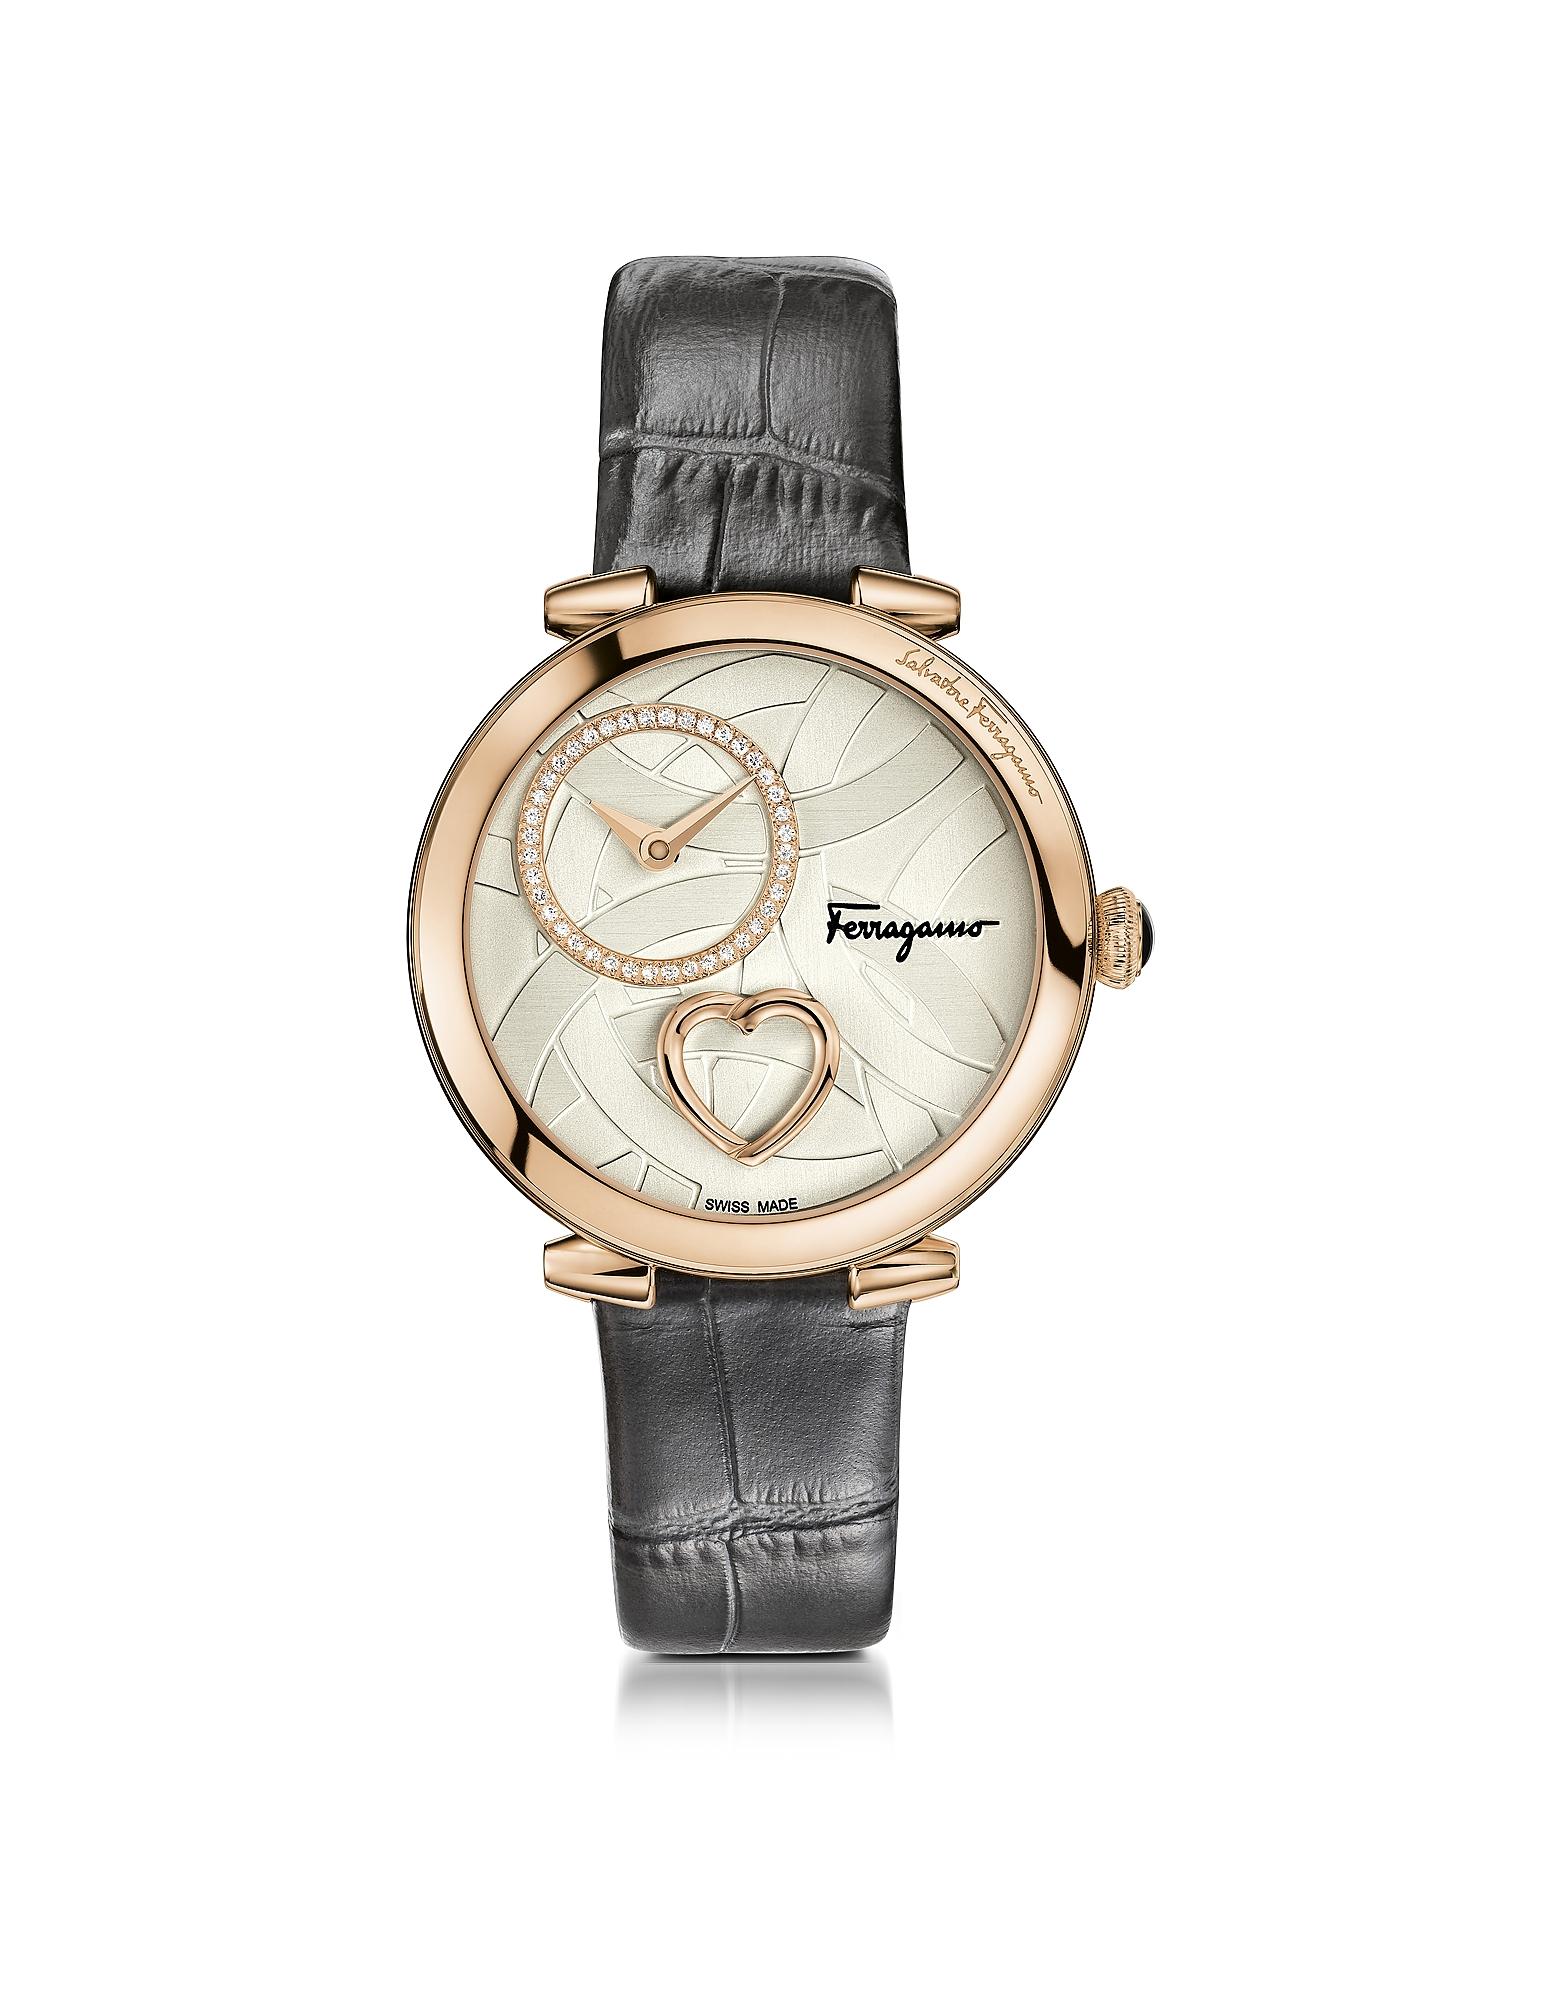 Salvatore Ferragamo Designer Women's Watches, Cuore Ferragamo Rose Gold IP Diamonds Women's Watch w/